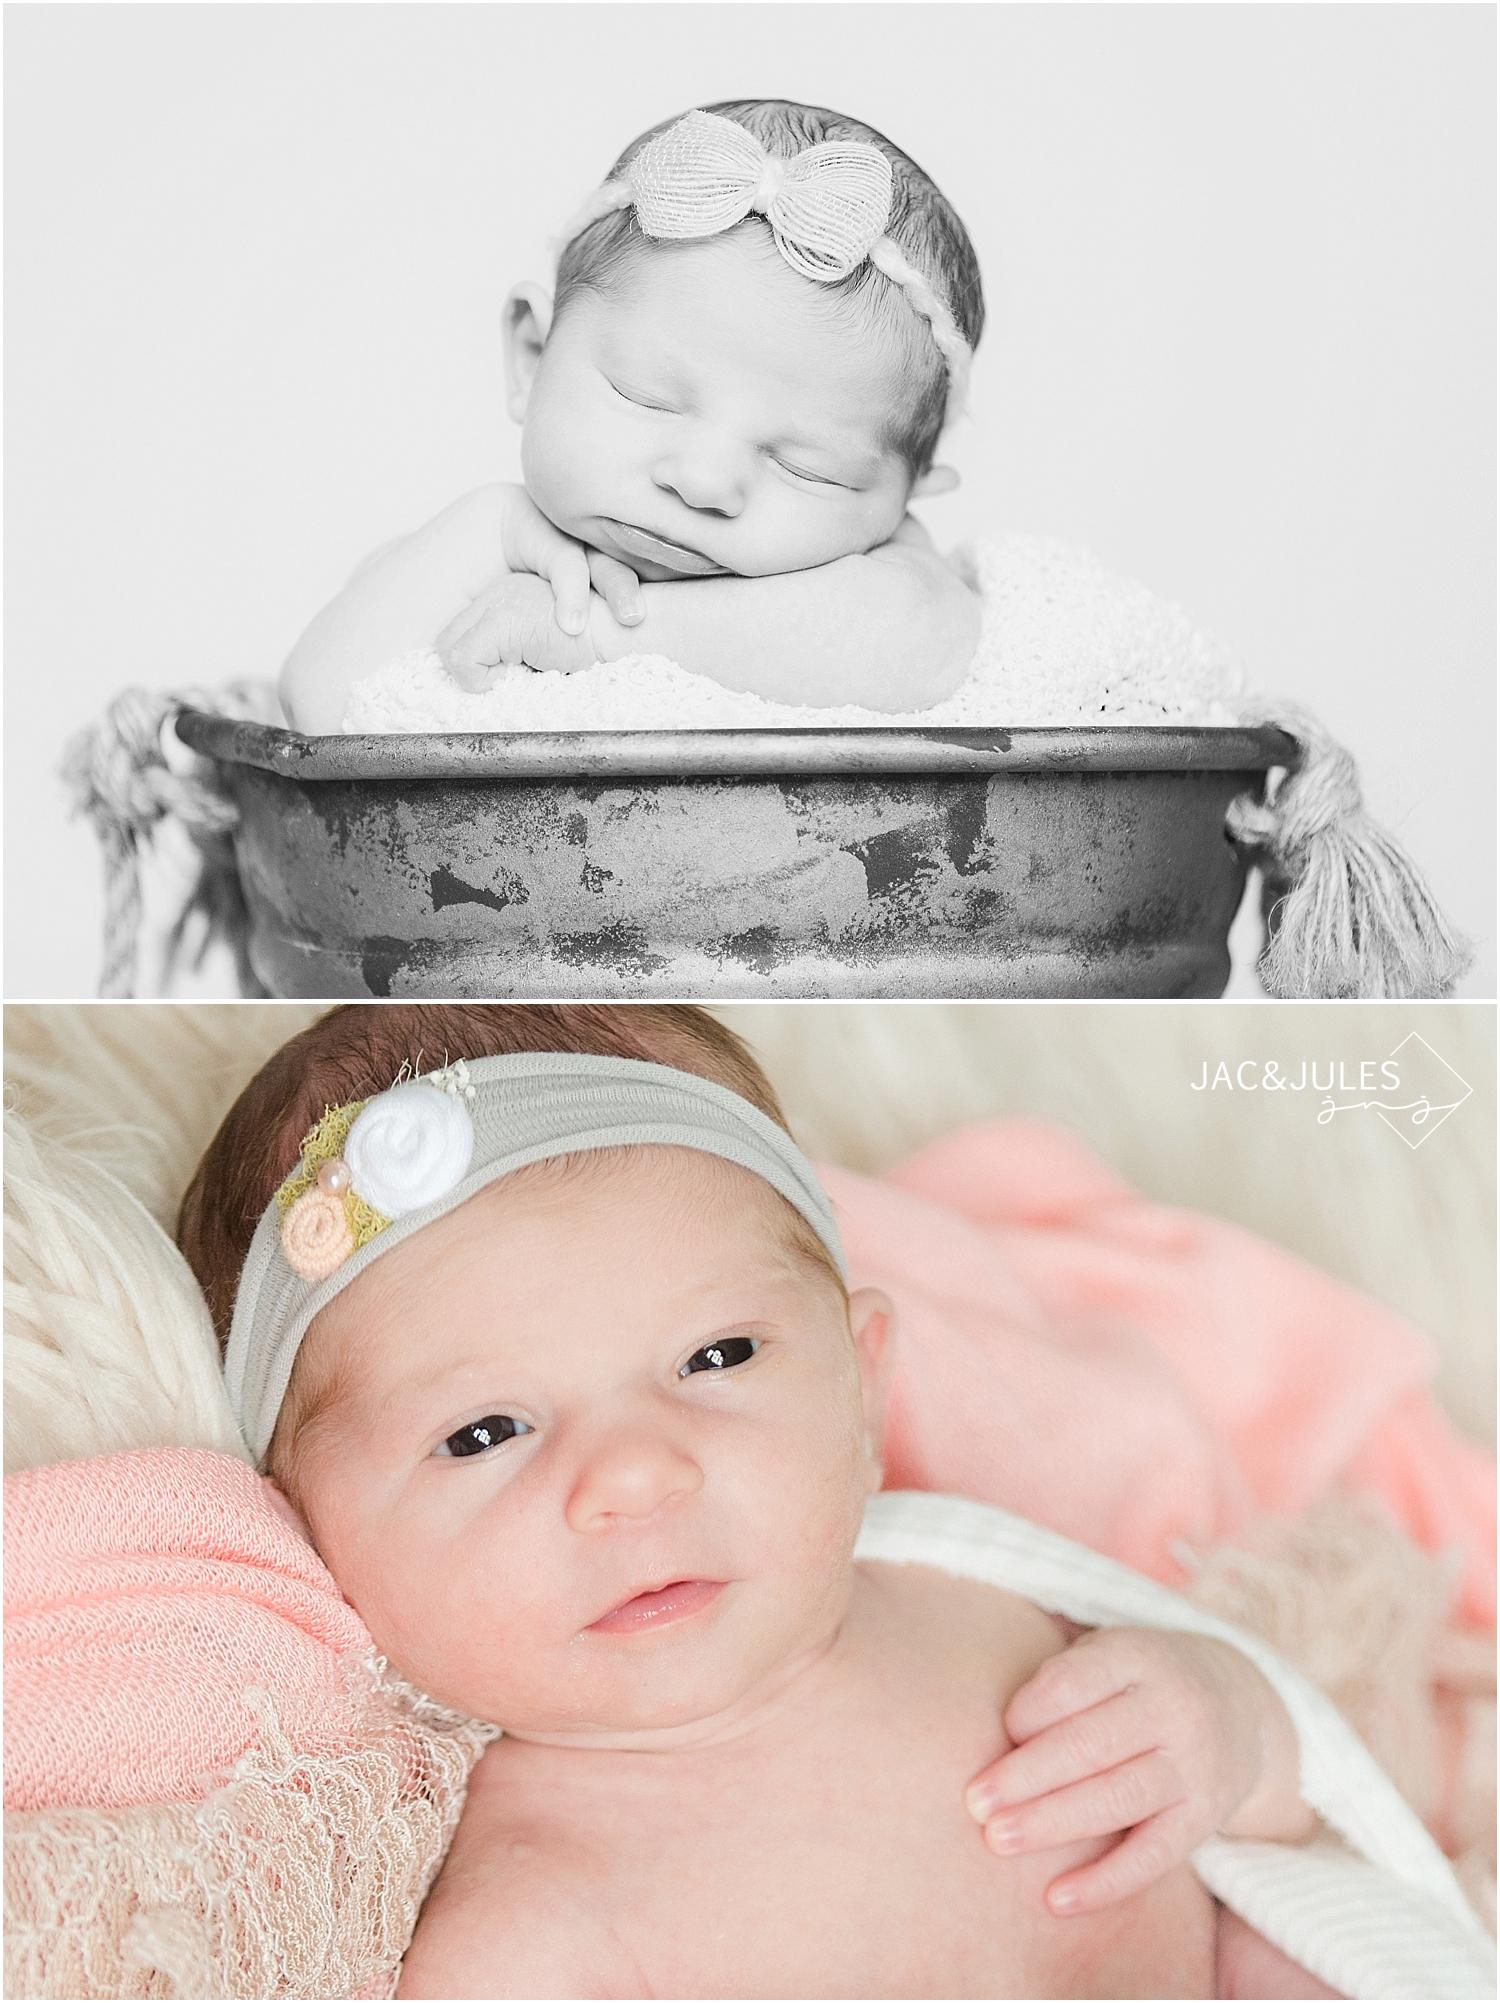 jacnjules photograph a newborn baby girl awake in Toms River, NJ